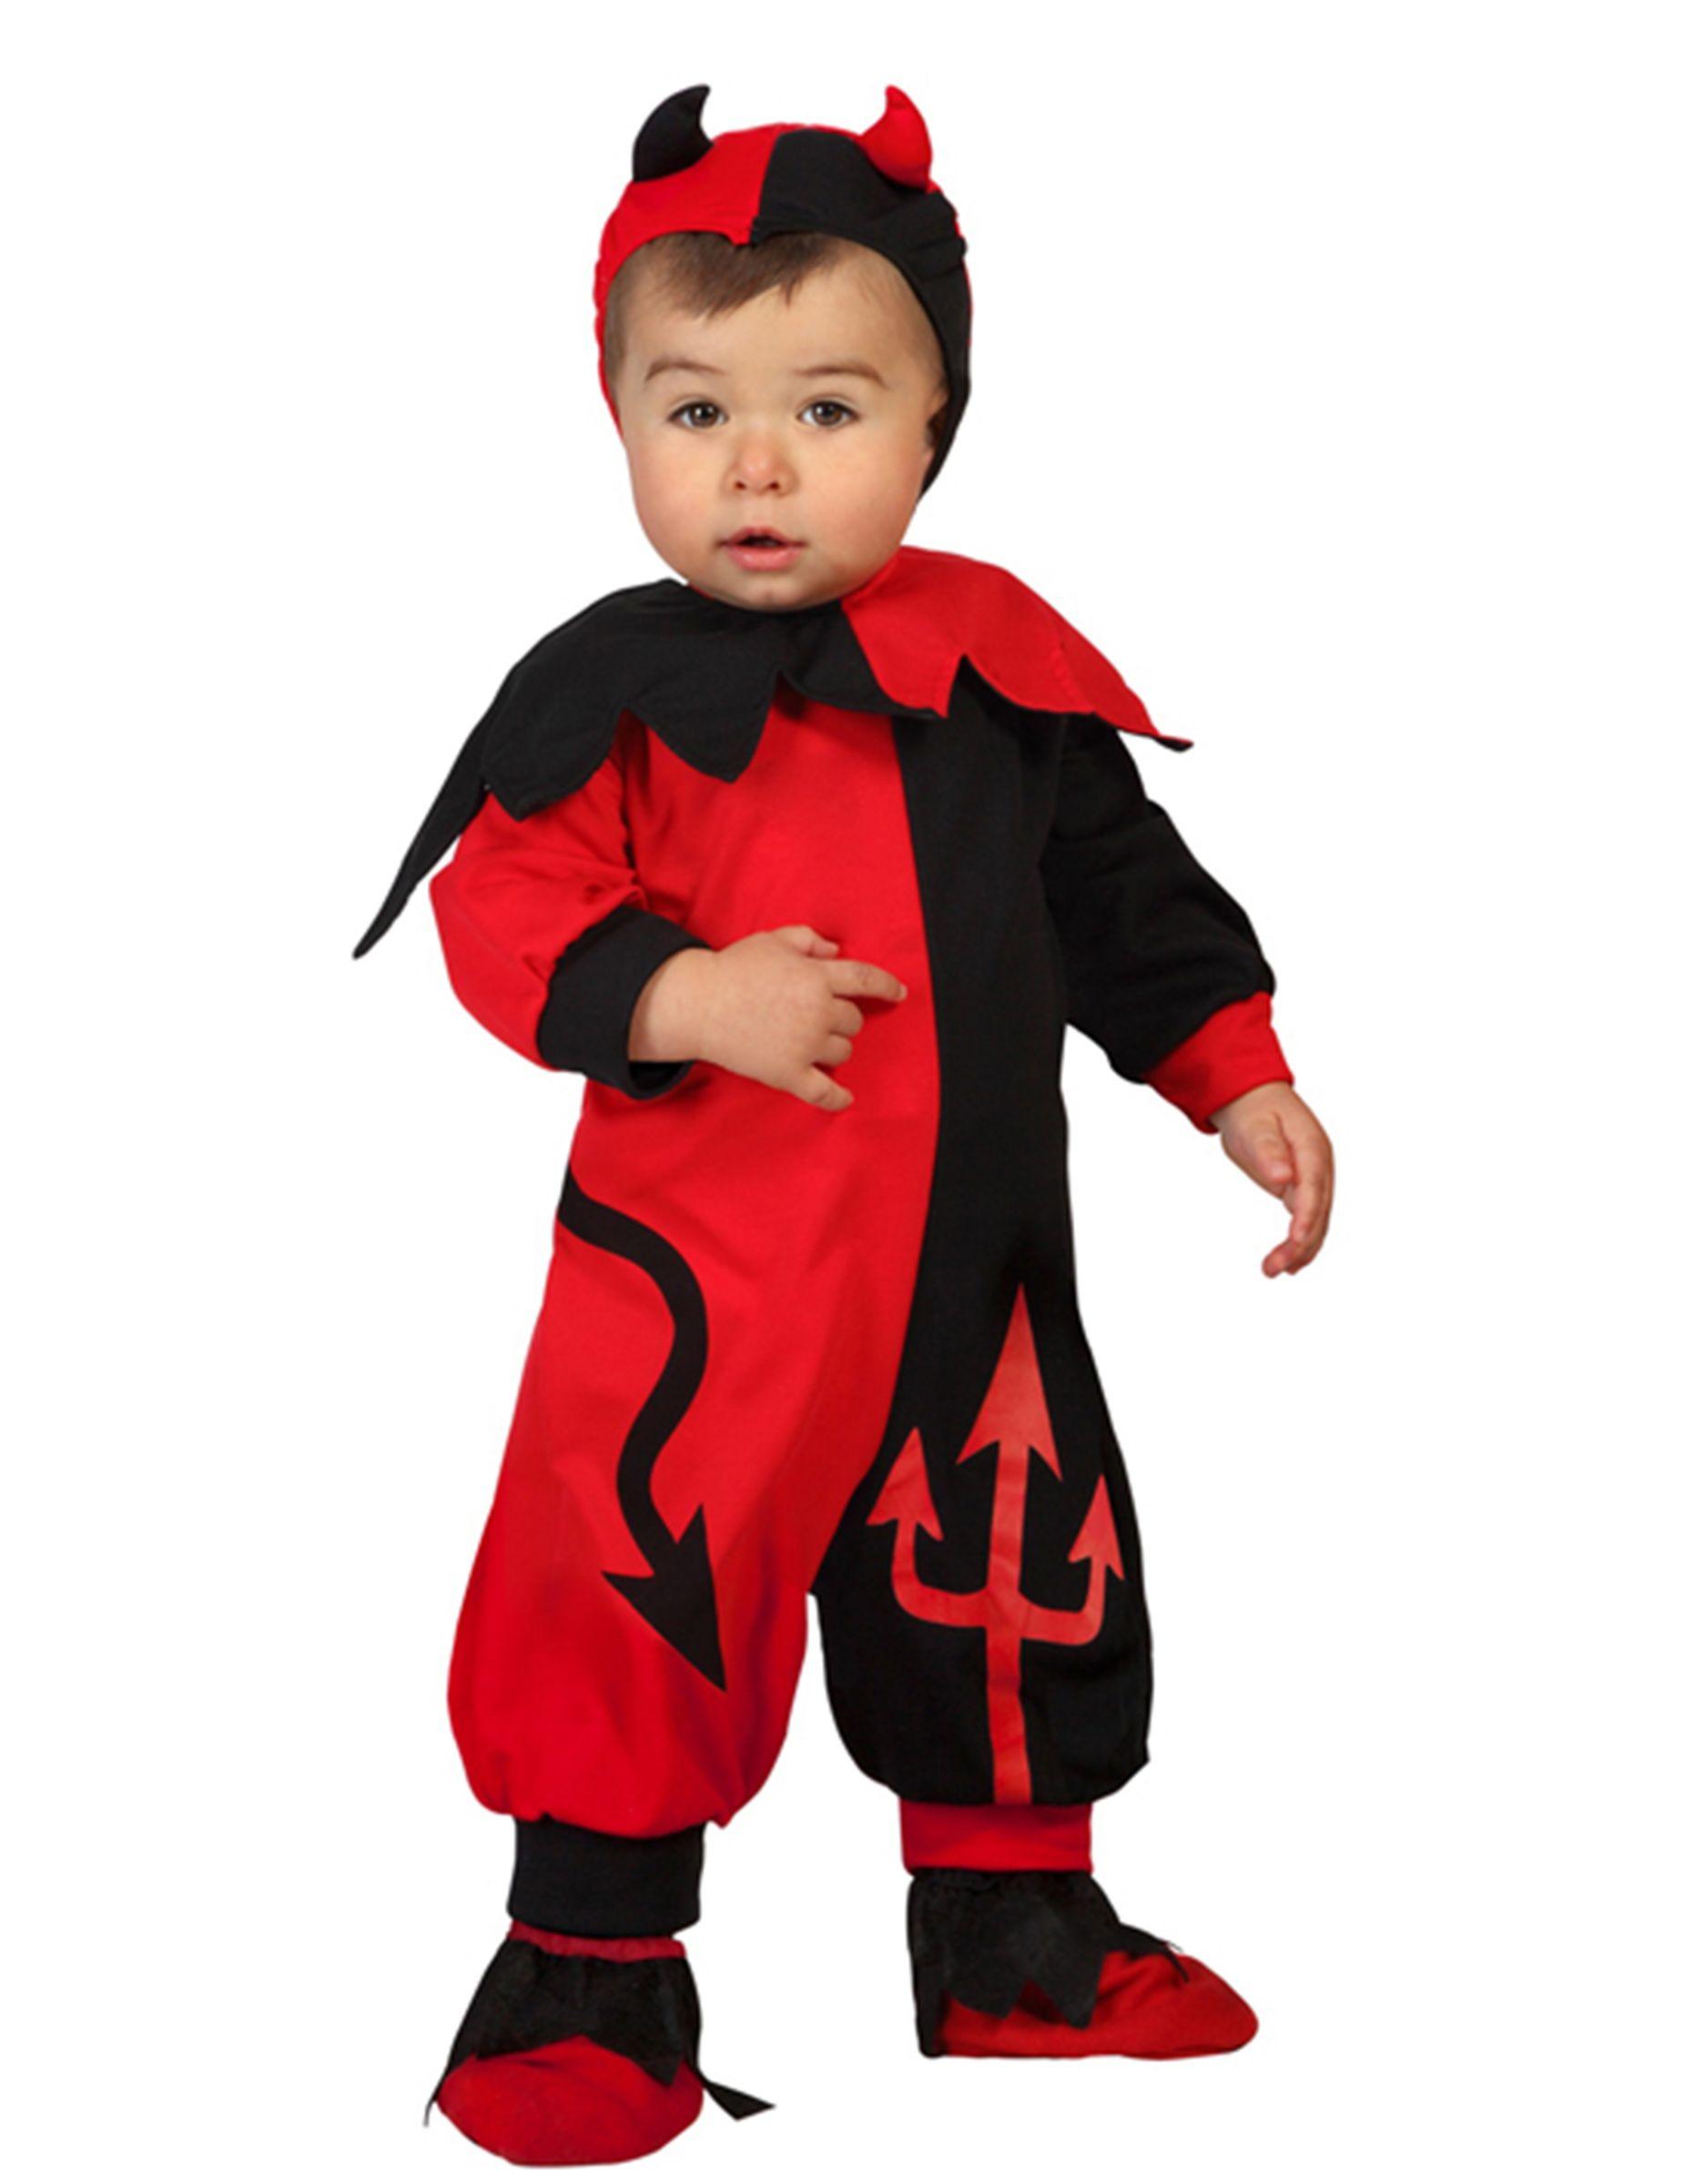 Pin en Halloween niños